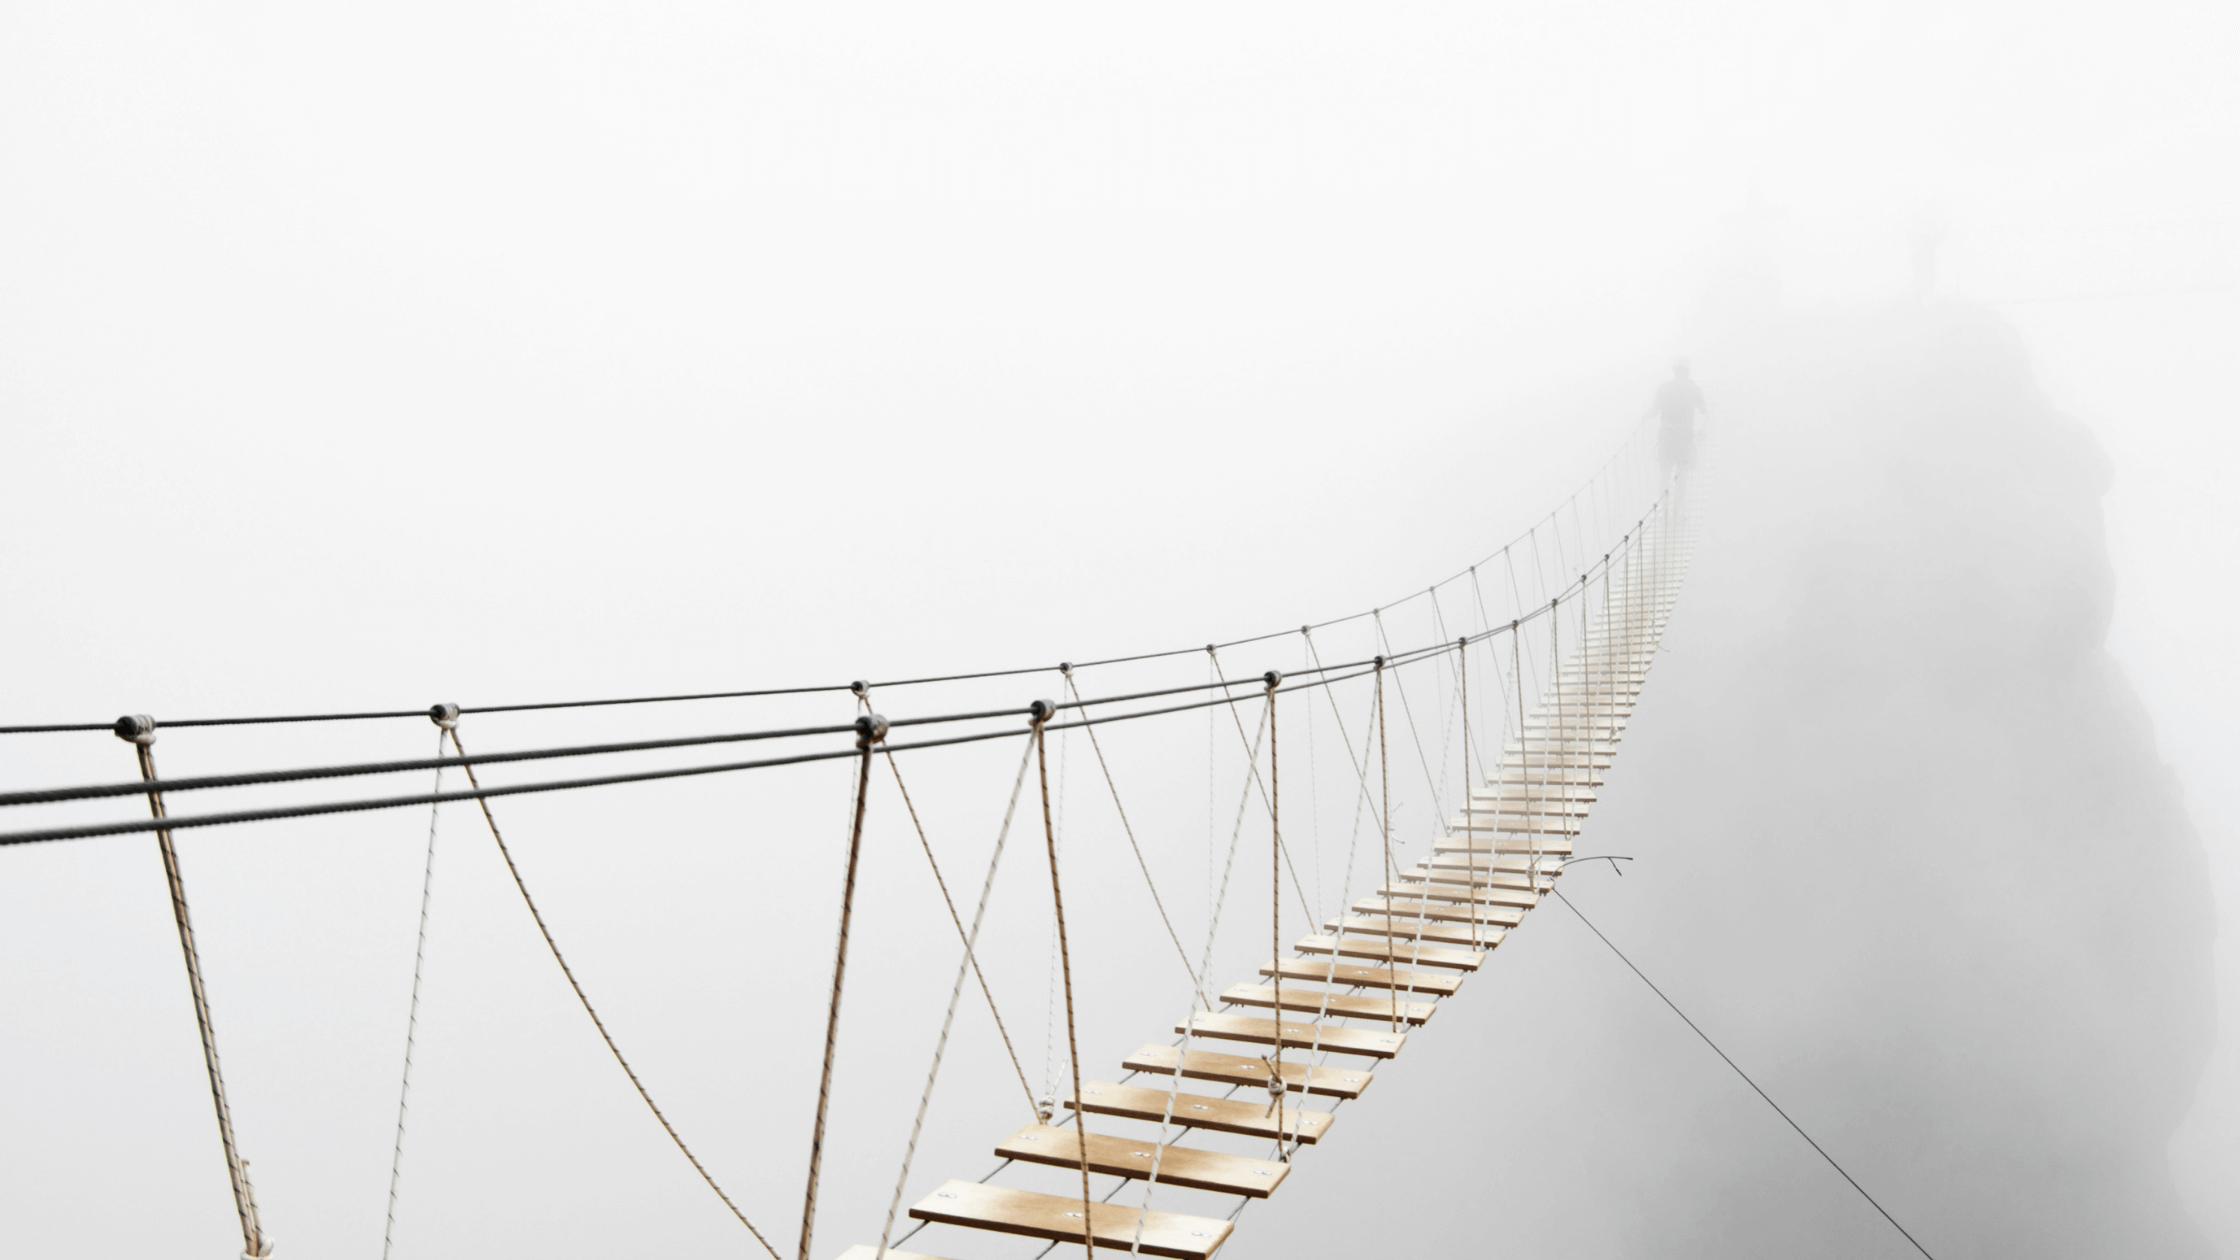 bridge in fog-overcoming the spirit of fear